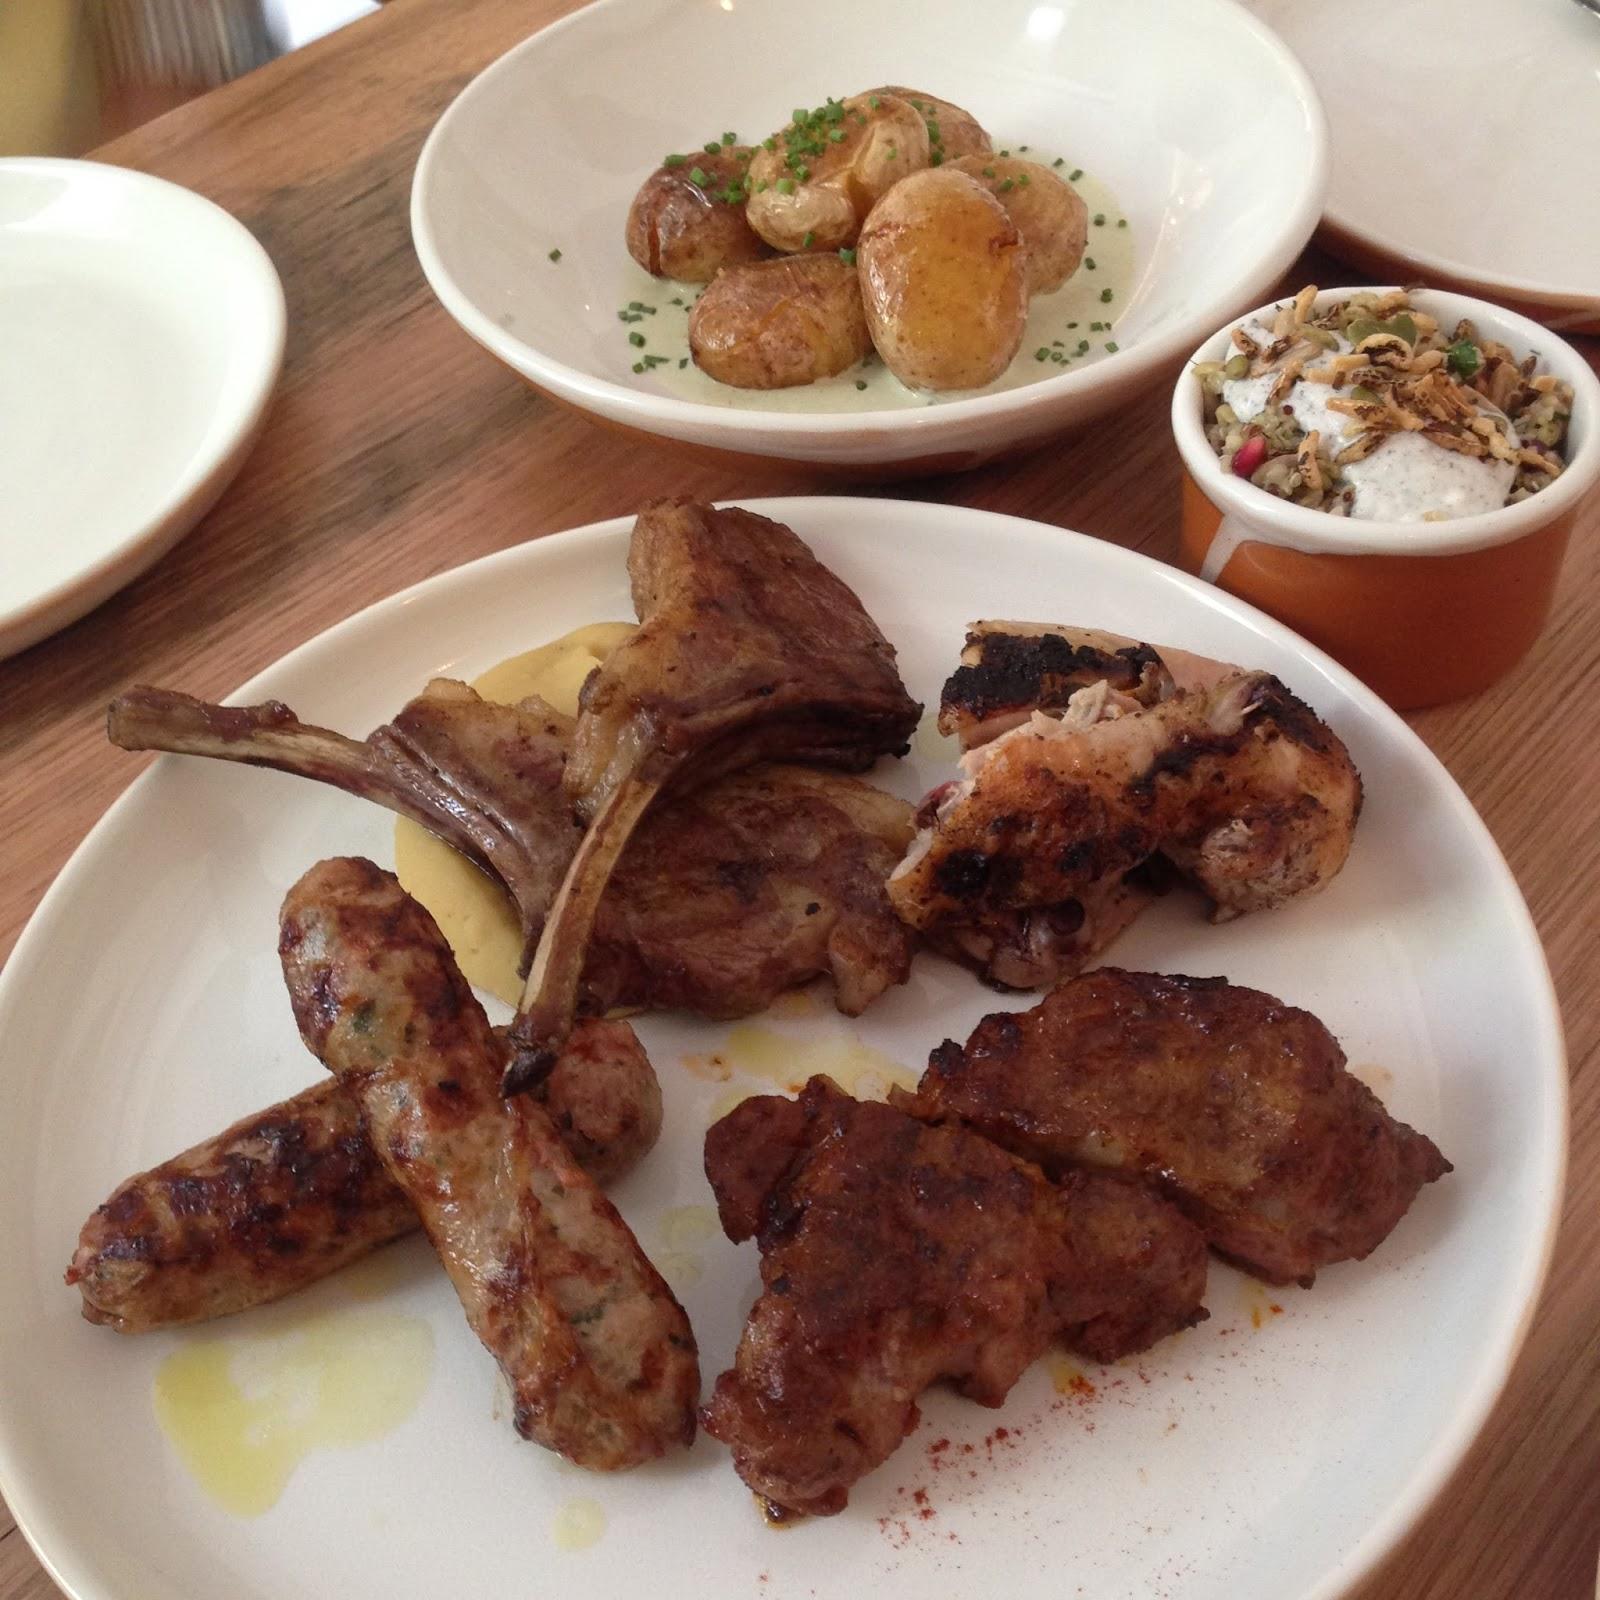 olea, electra house, adelaide, food, king william street, greek, meat, potatoes, ancient grains, tasting plate